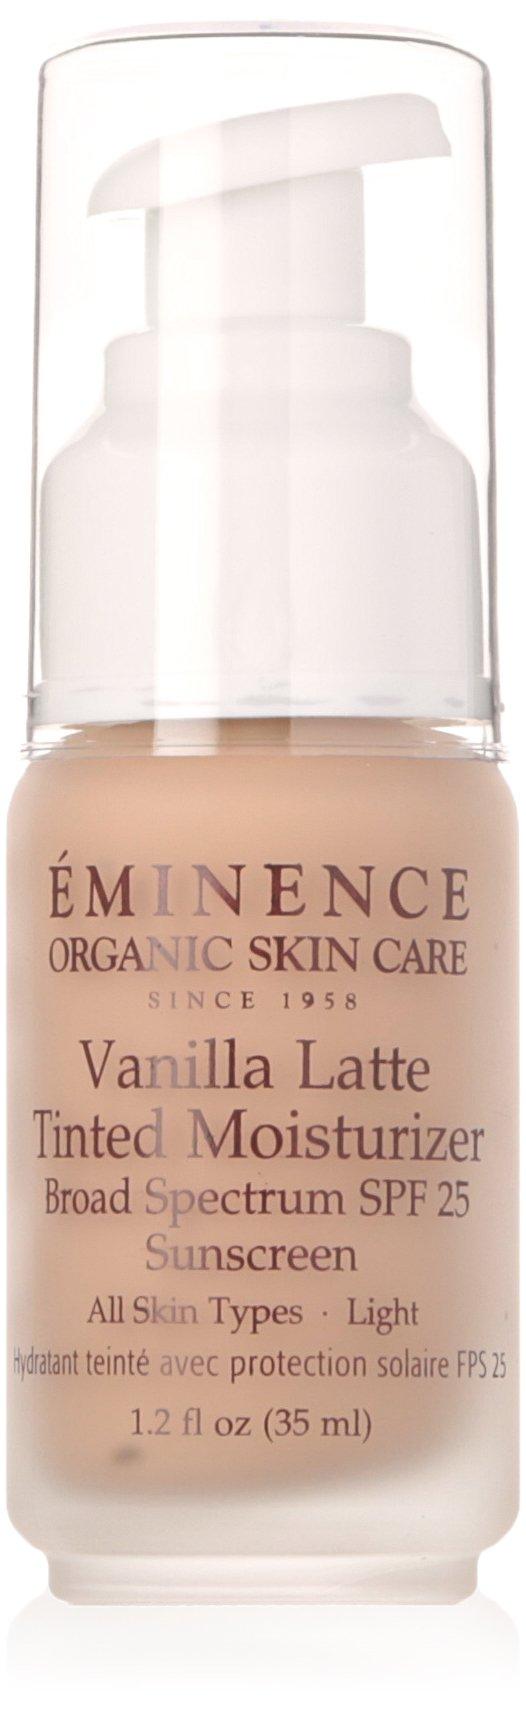 Eminence Vanilla Latte Tinted Moisturizer SPF 25, 1.2 Ounce by Eminence (Image #1)